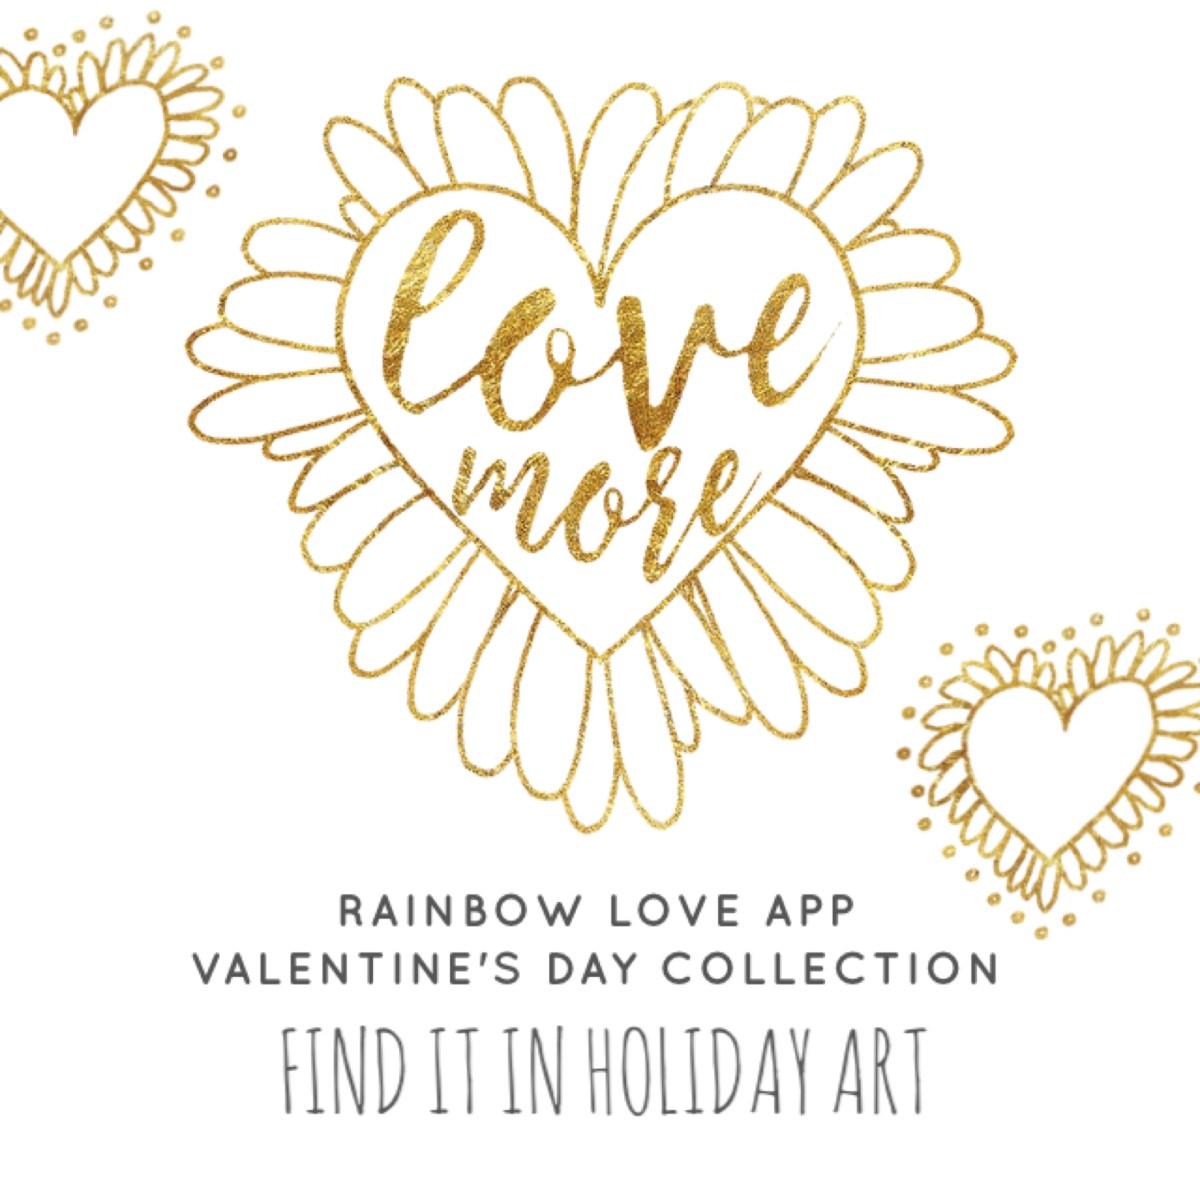 rainbow-love-app-valentines-day-photo-art-and-filters-make-a-rainbow-love-valentine-day-card-4